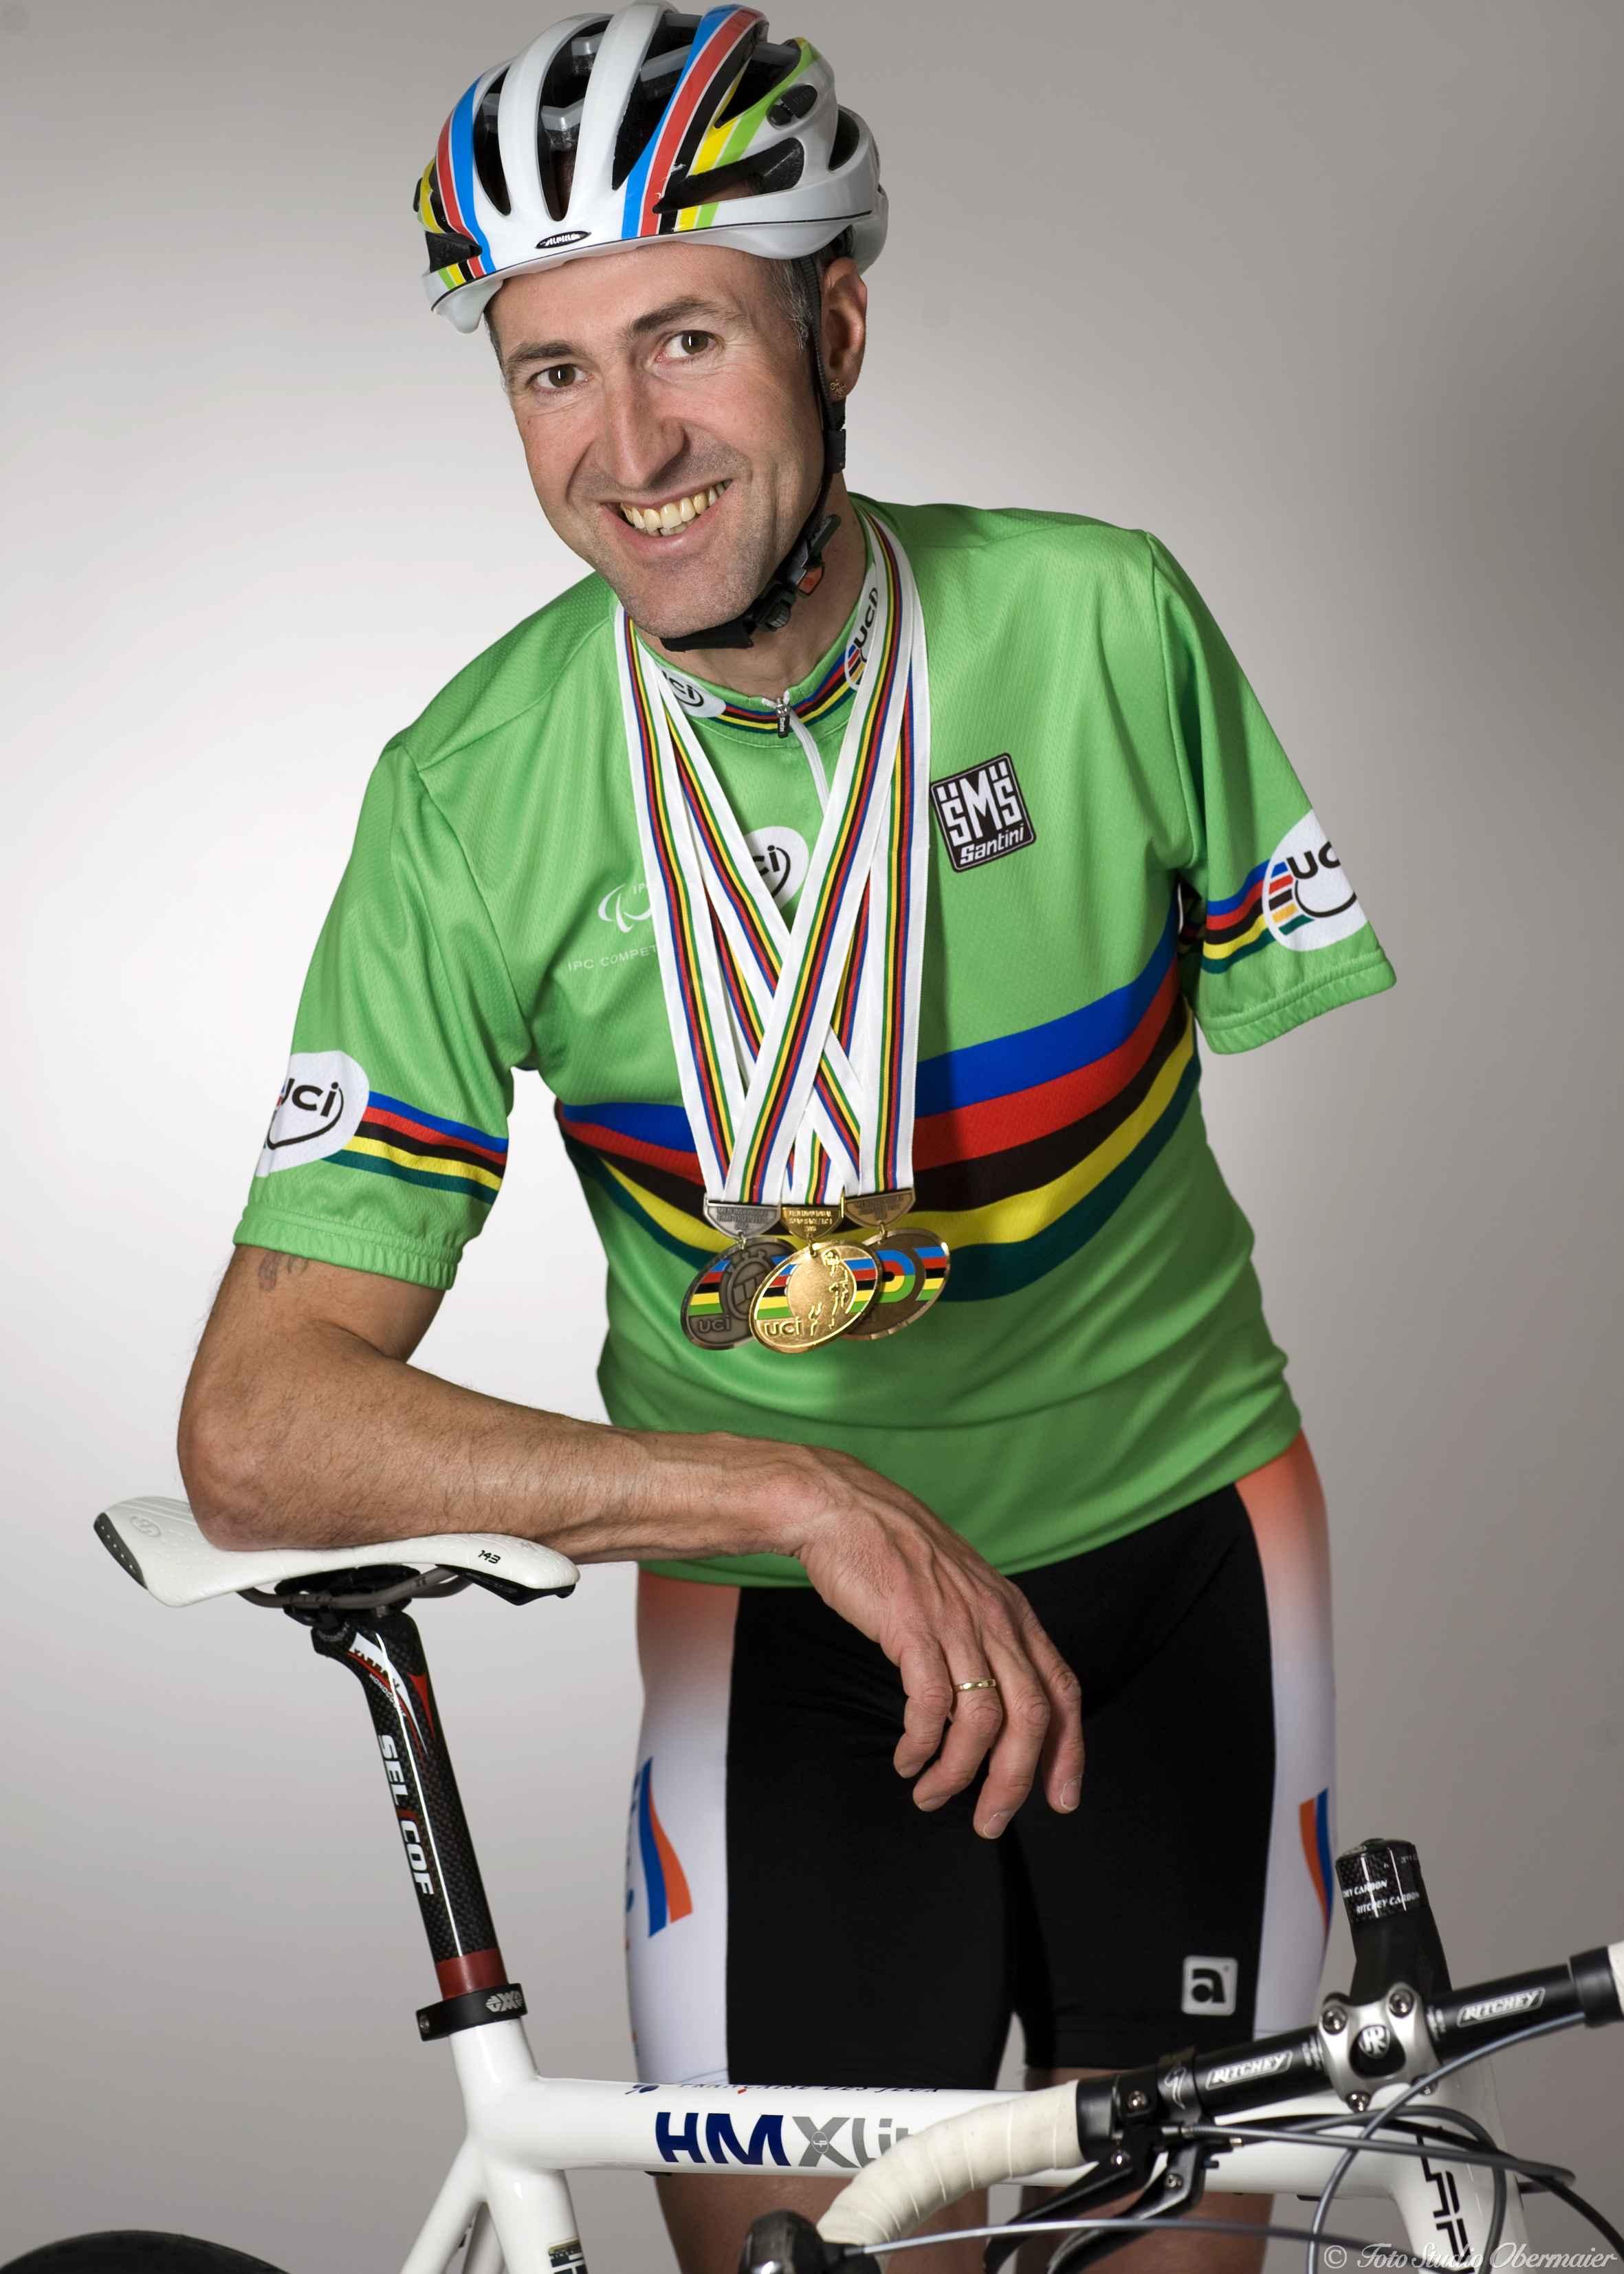 Sacher_Weltmeister2006